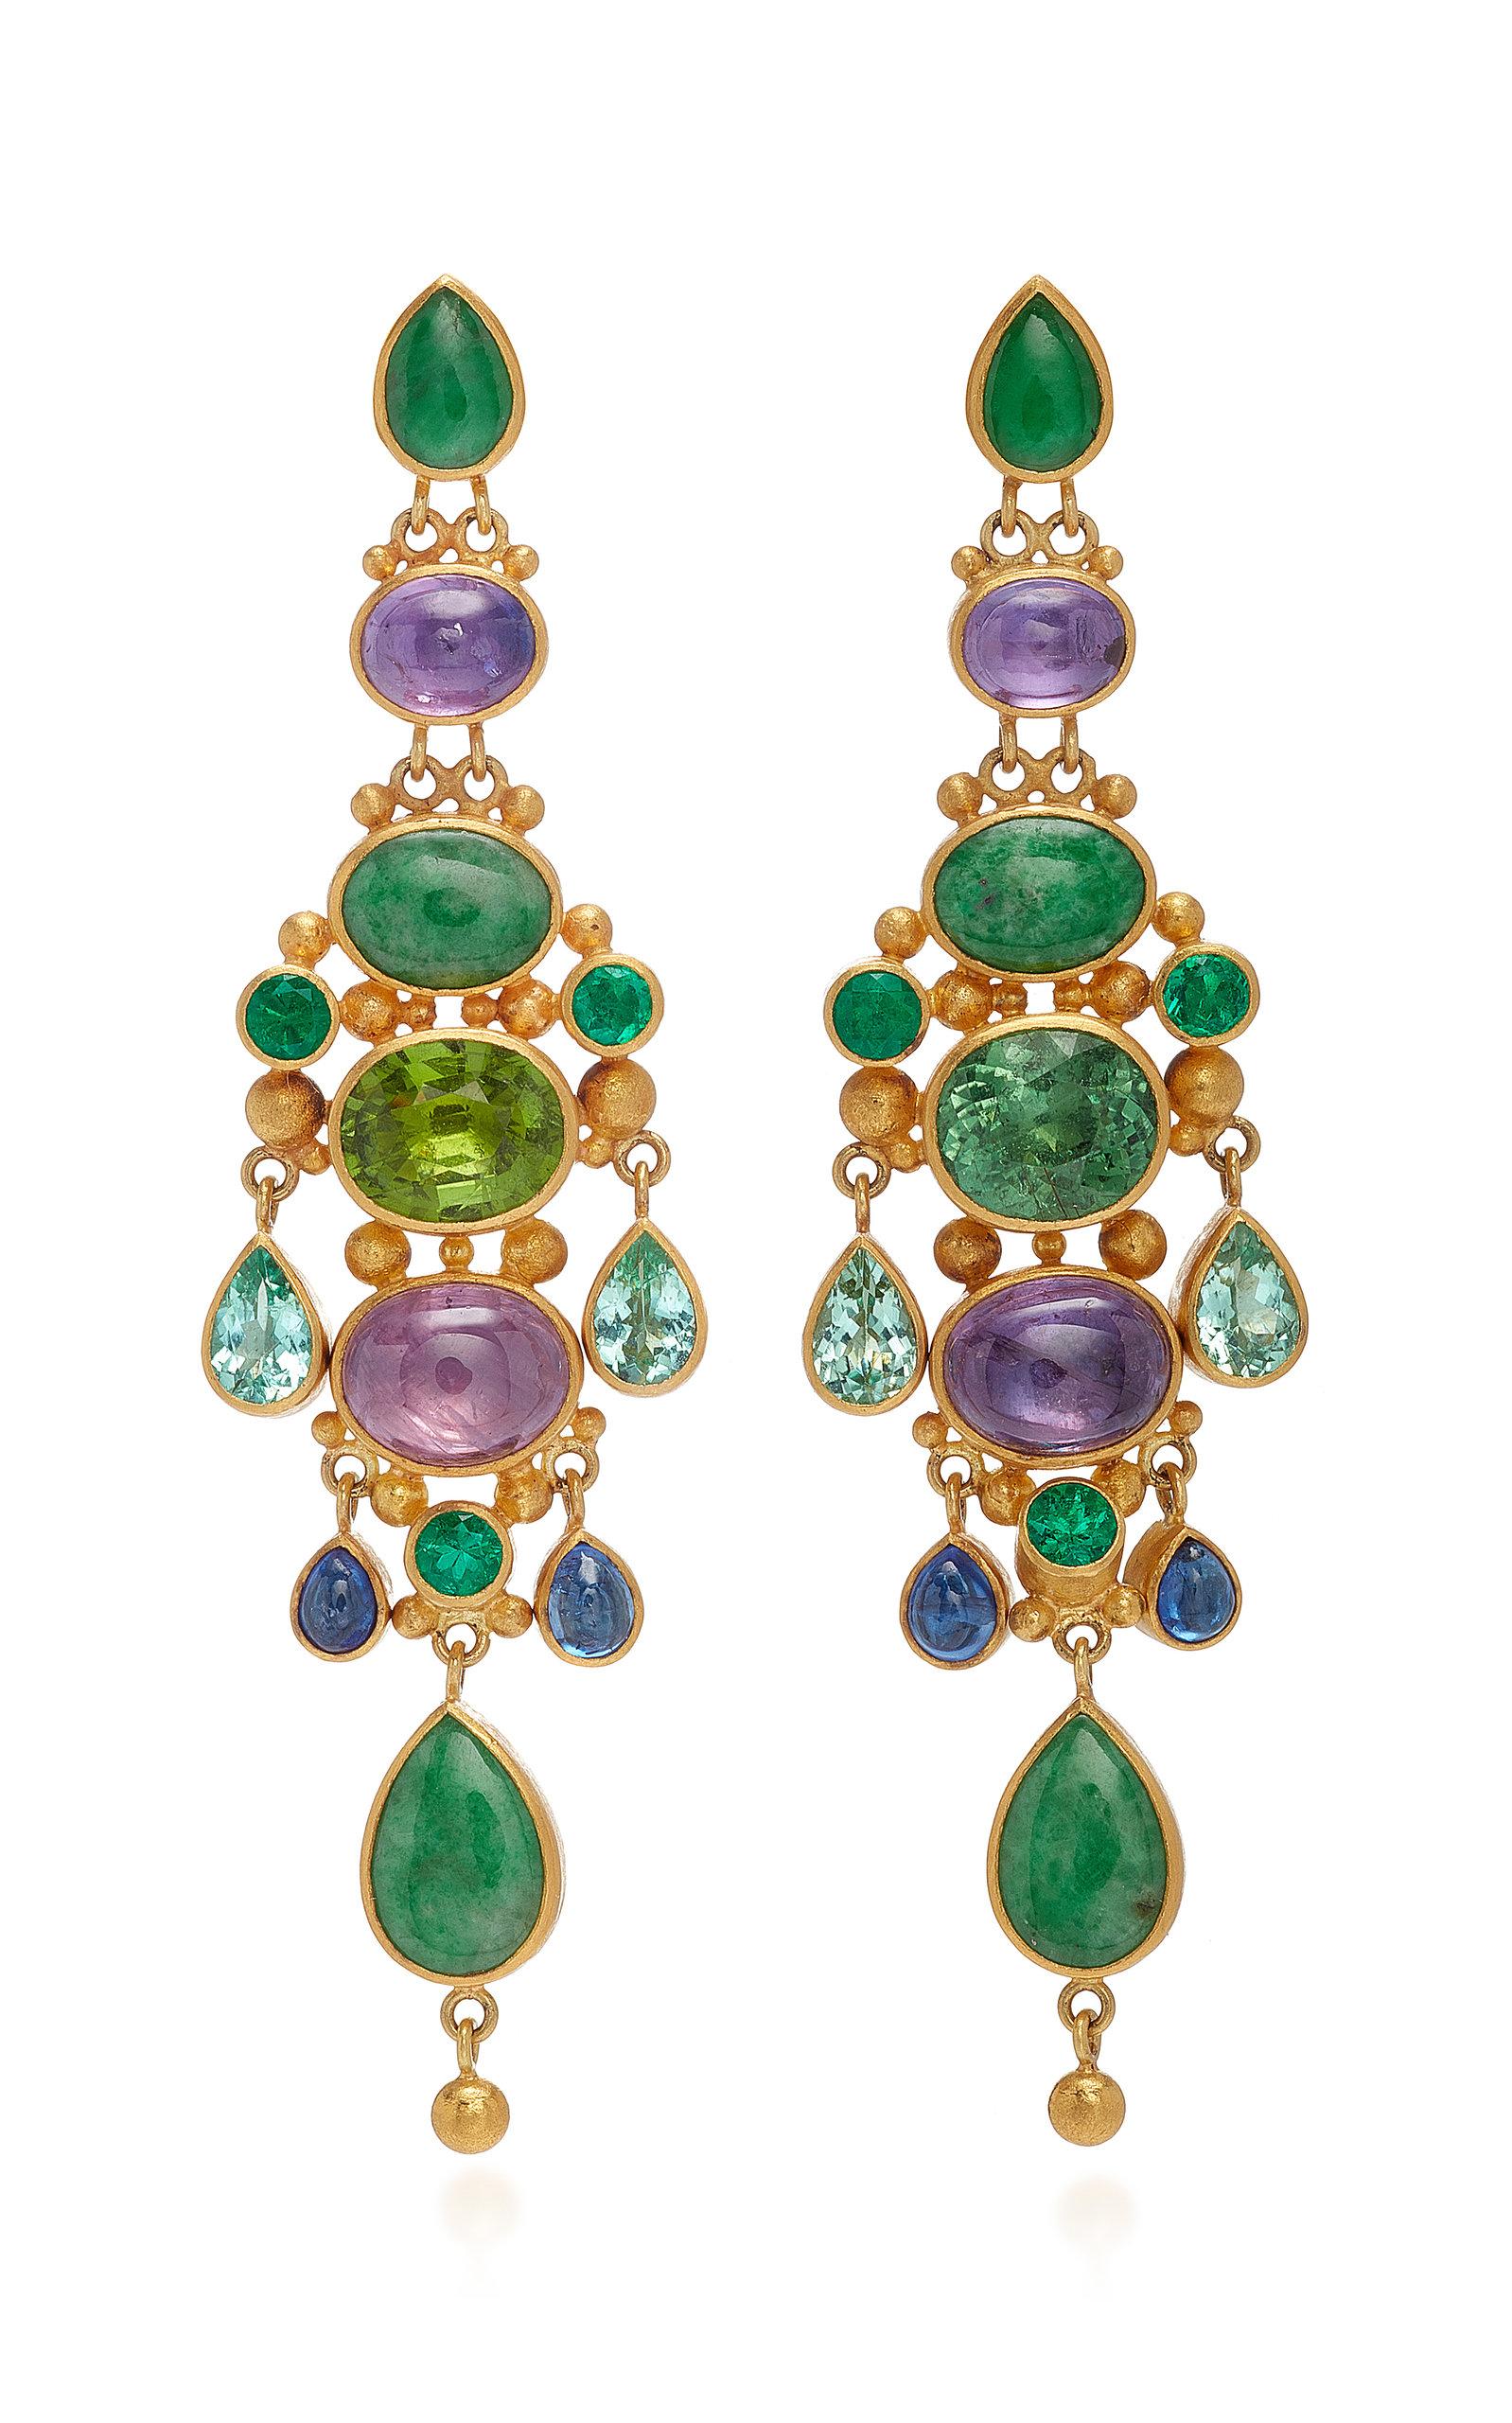 MALLARY MARKS Chandelier 18K Gold And Multi-Stone Earrings